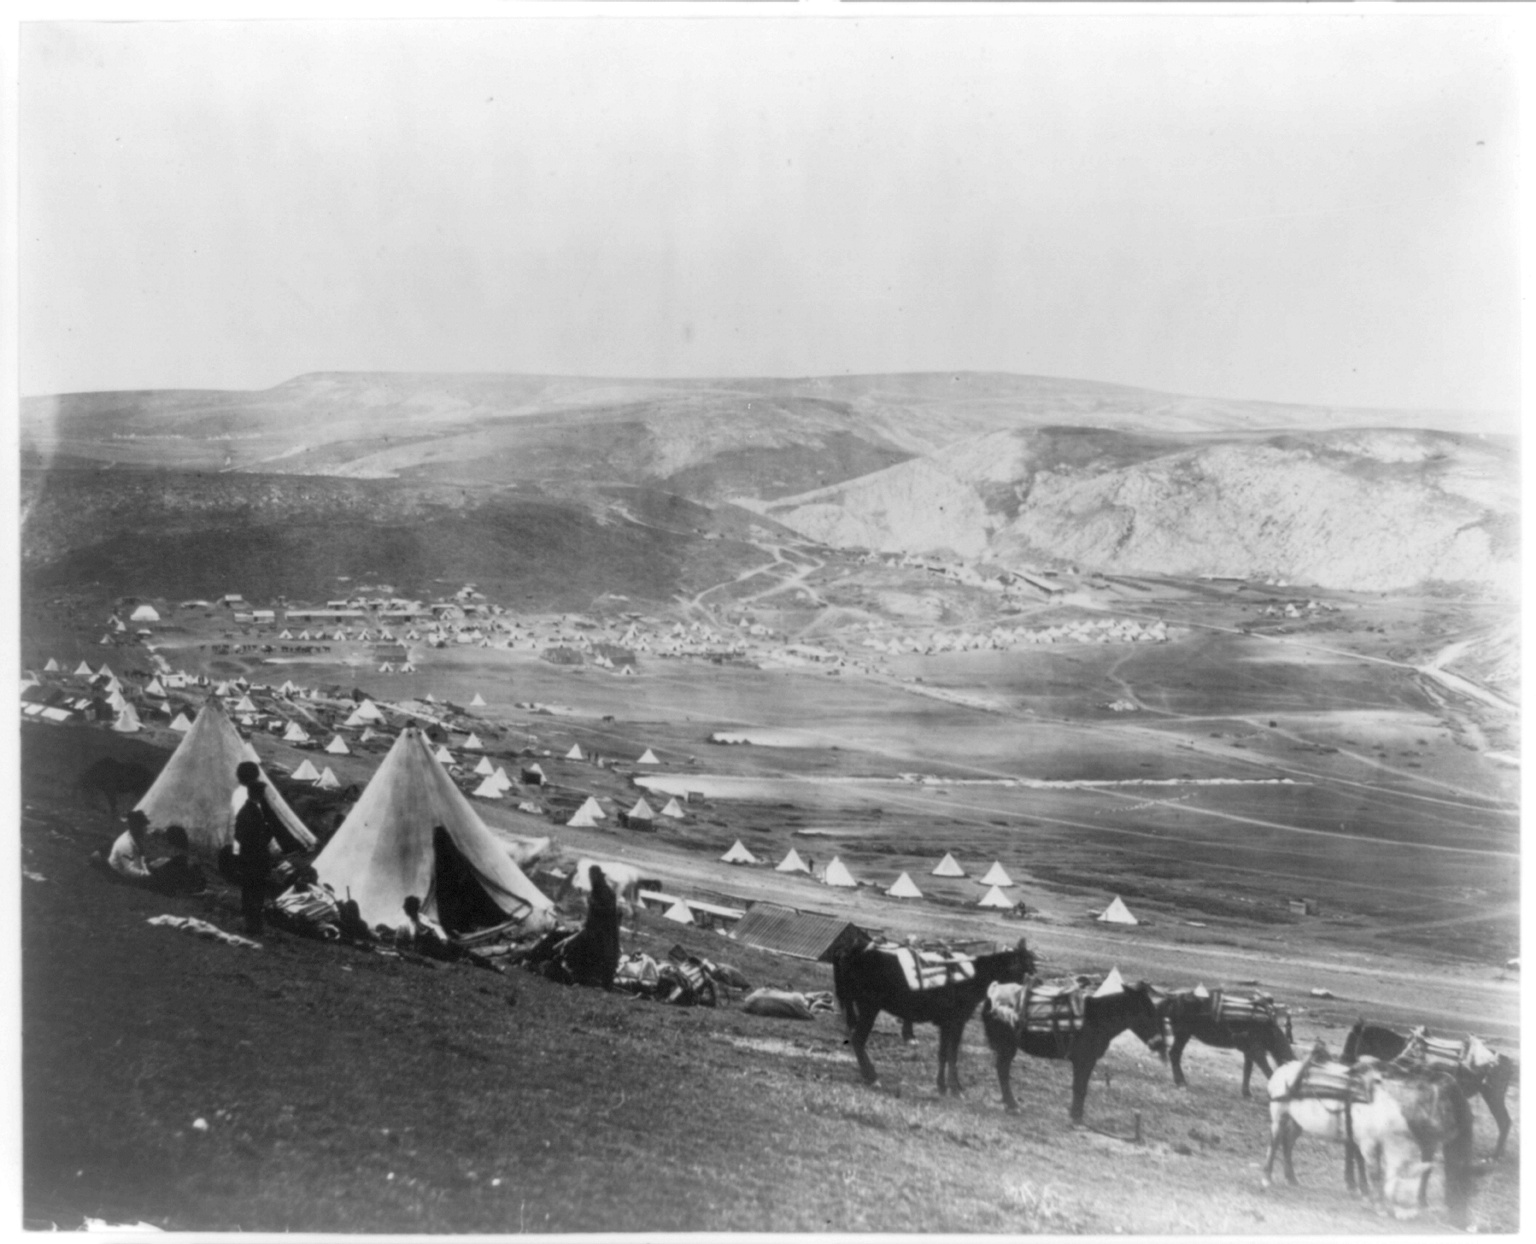 File:Cavalry camp near Balaklava 1855.3a34625r.jpg